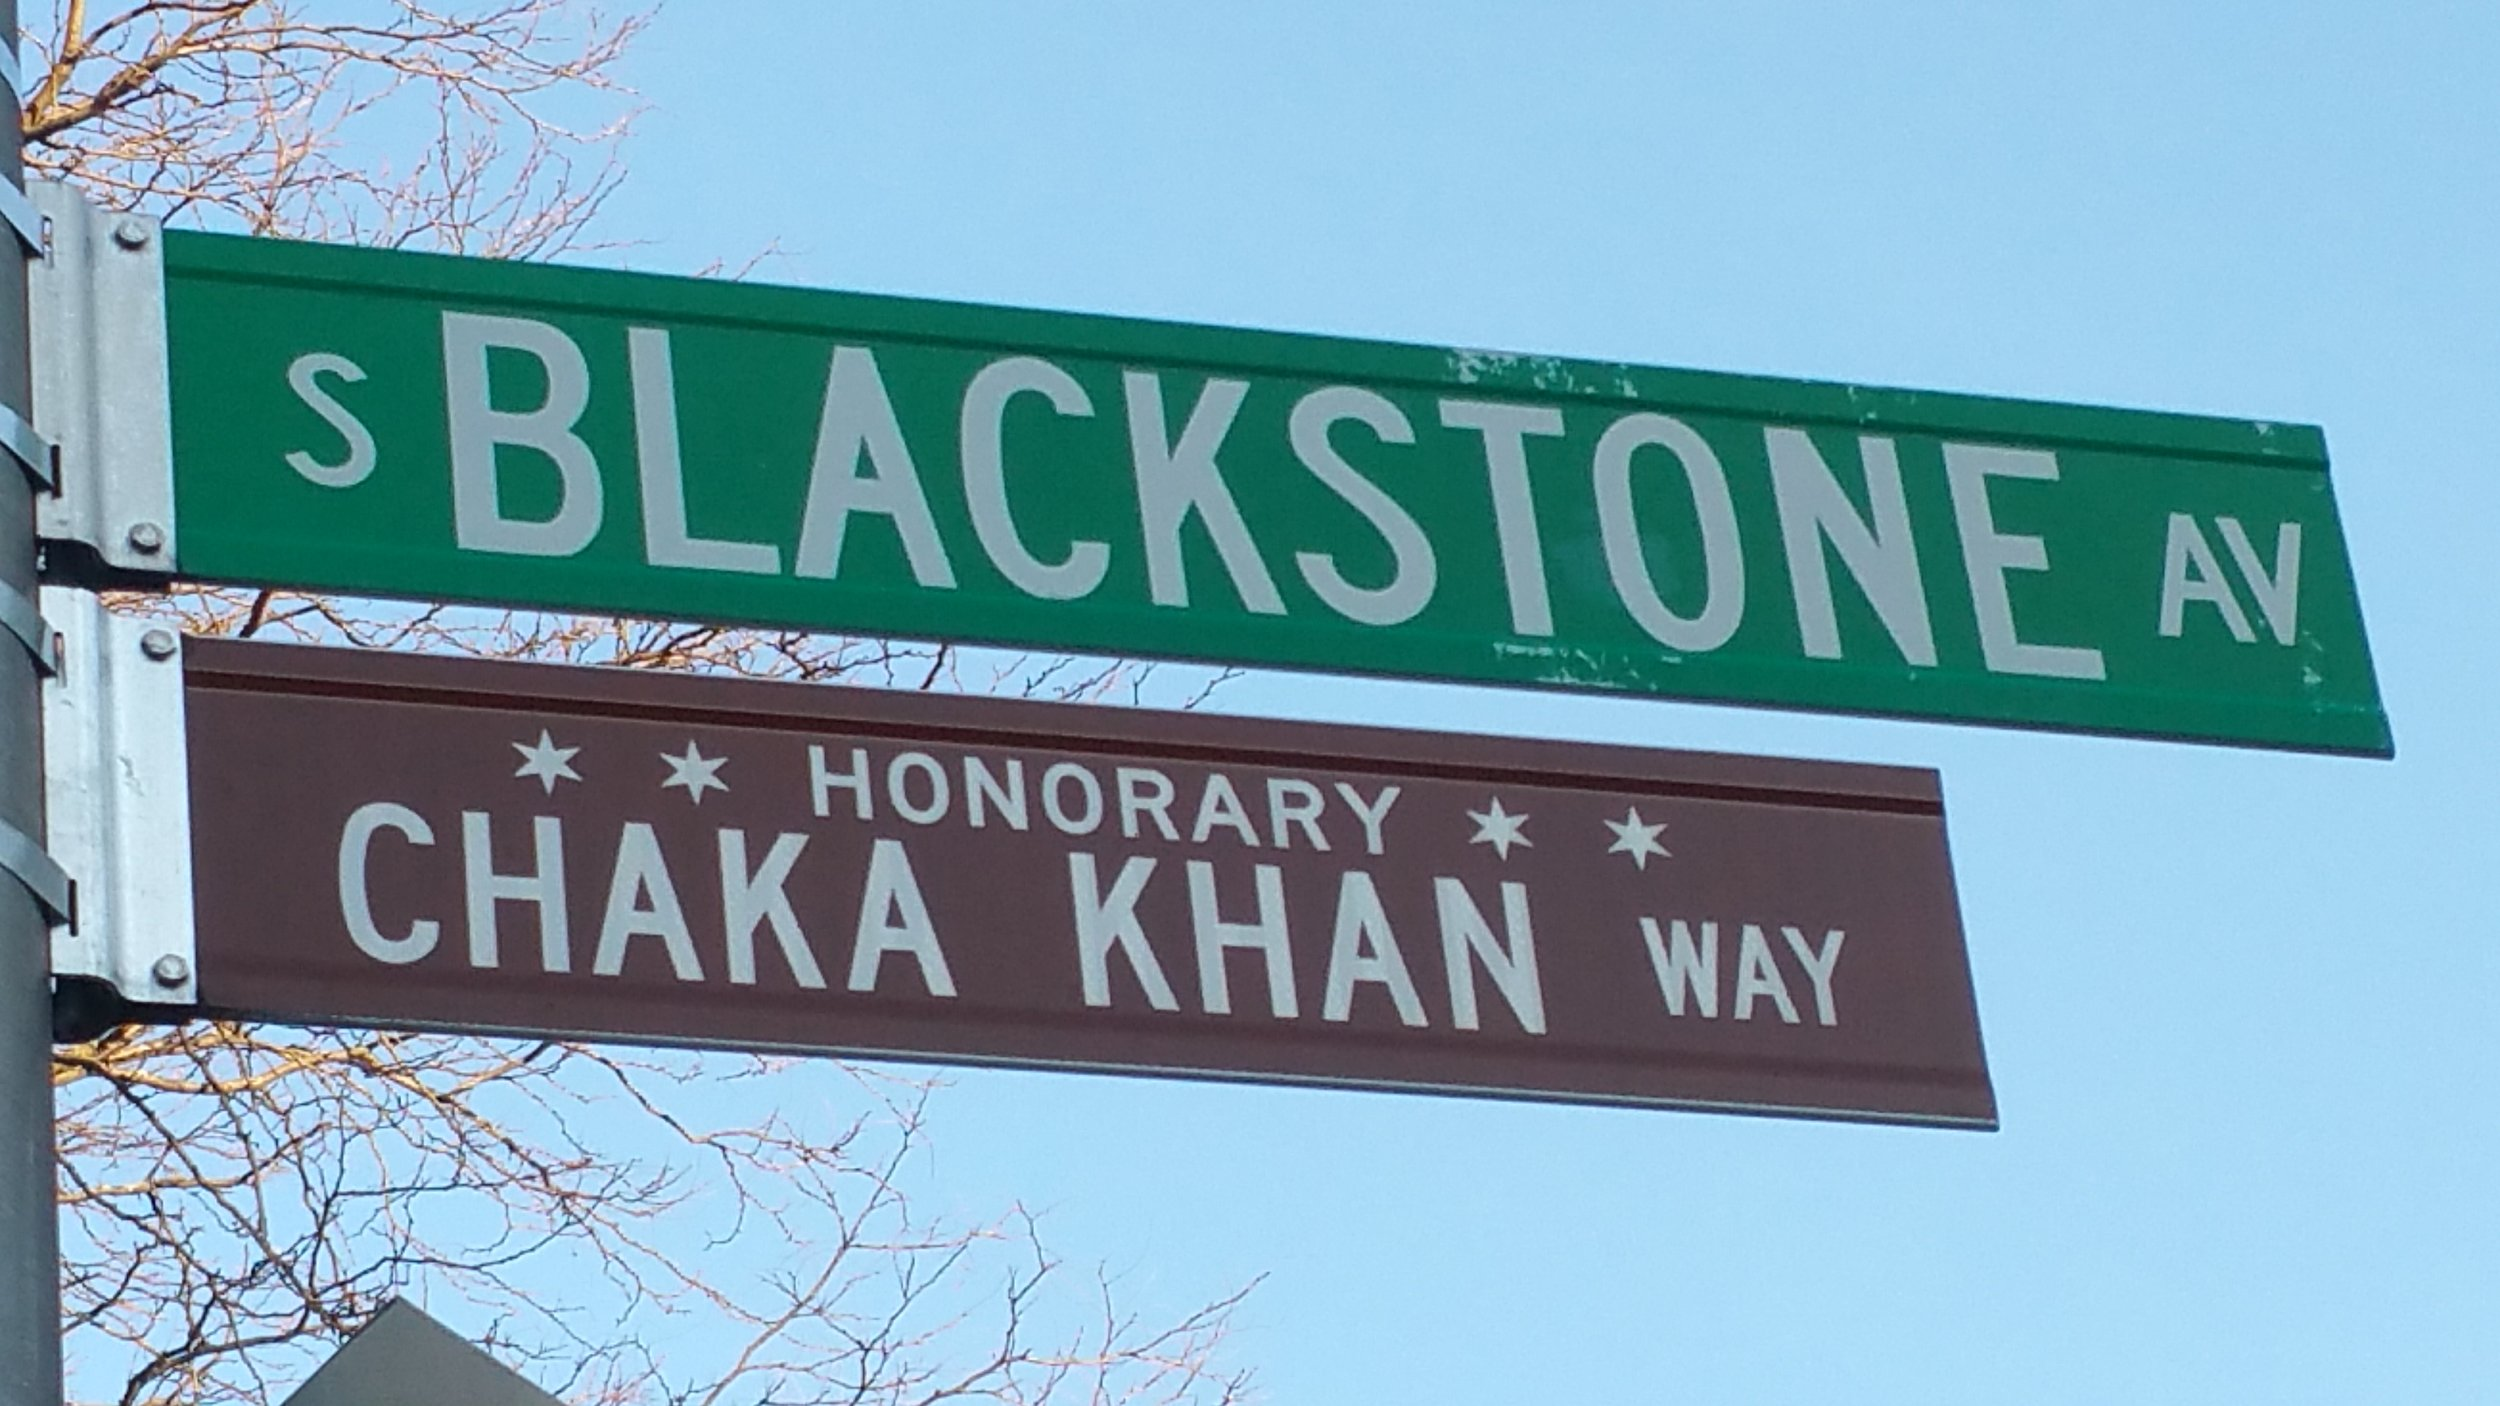 20161112_Chaka Khan Way - Honorary Chicago street sign.jpg